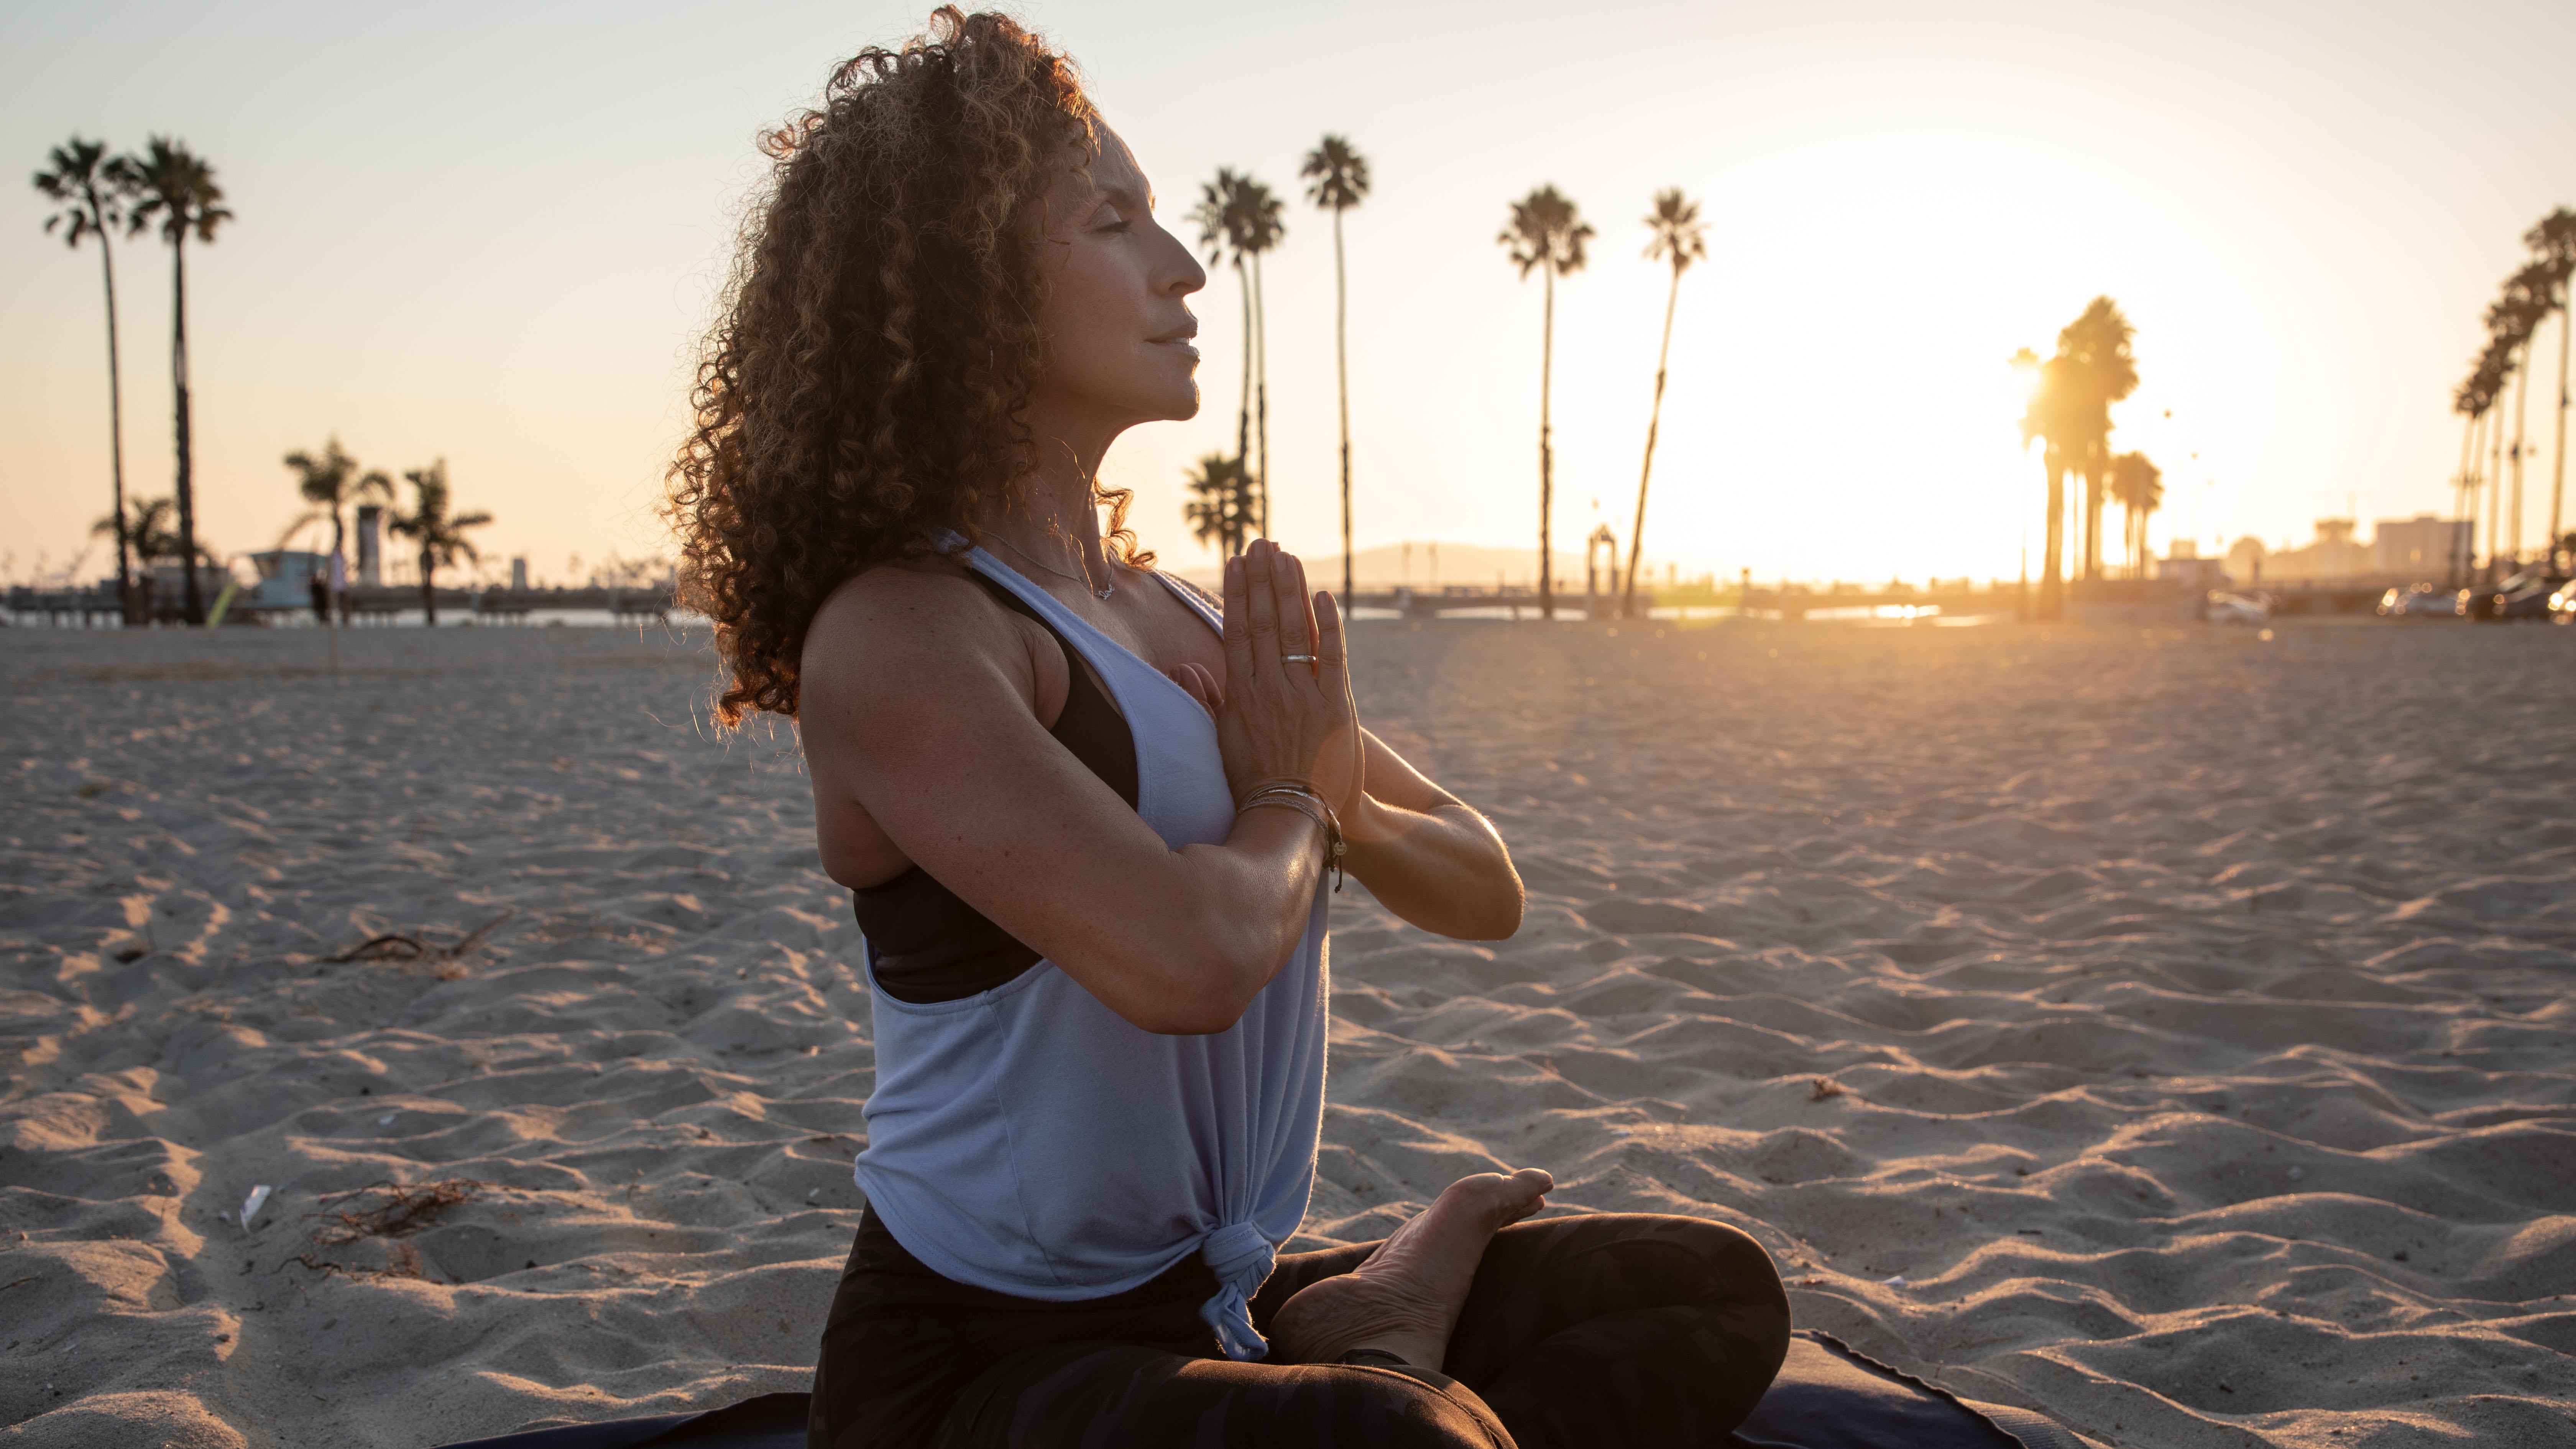 Mind & Body Woman Meditating on Beach